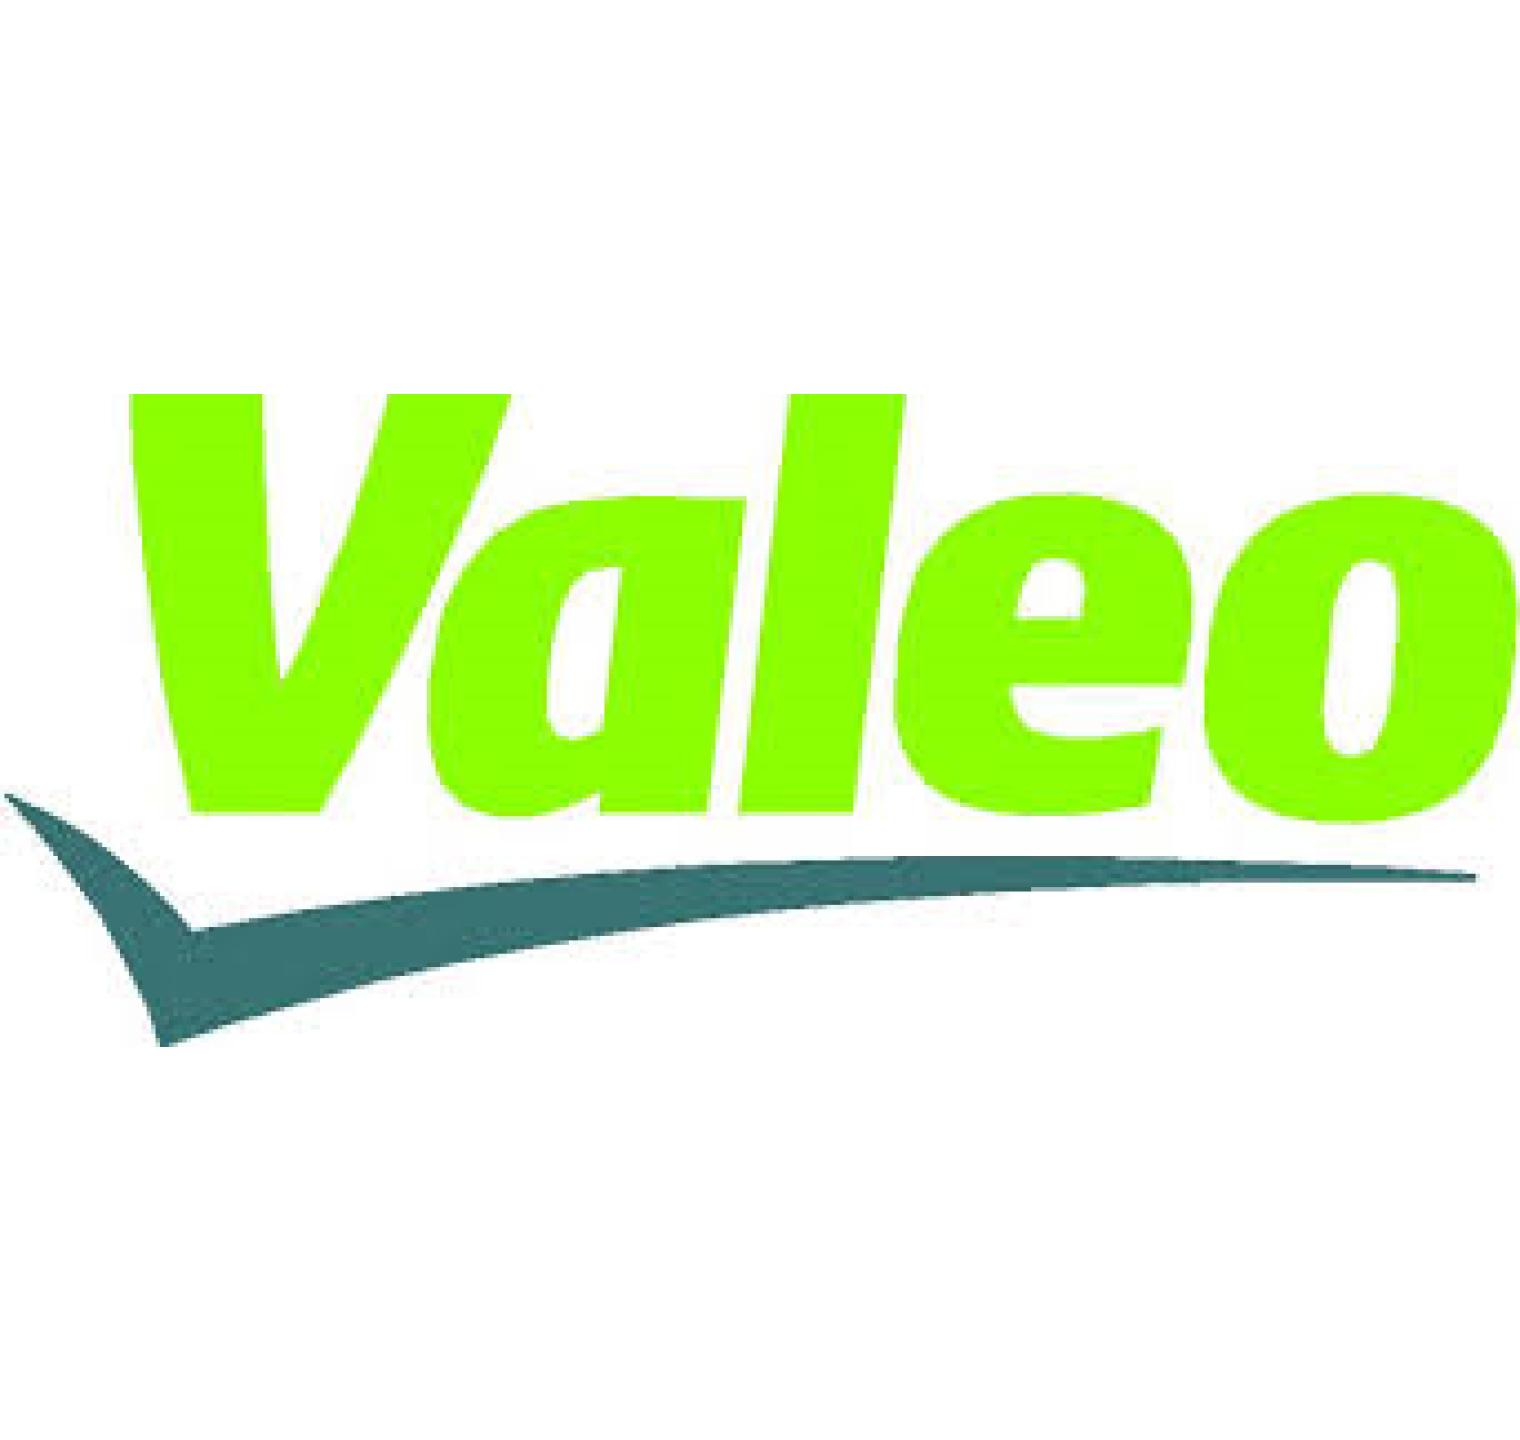 Valeo Parkeerhulp Systeem Kit 1